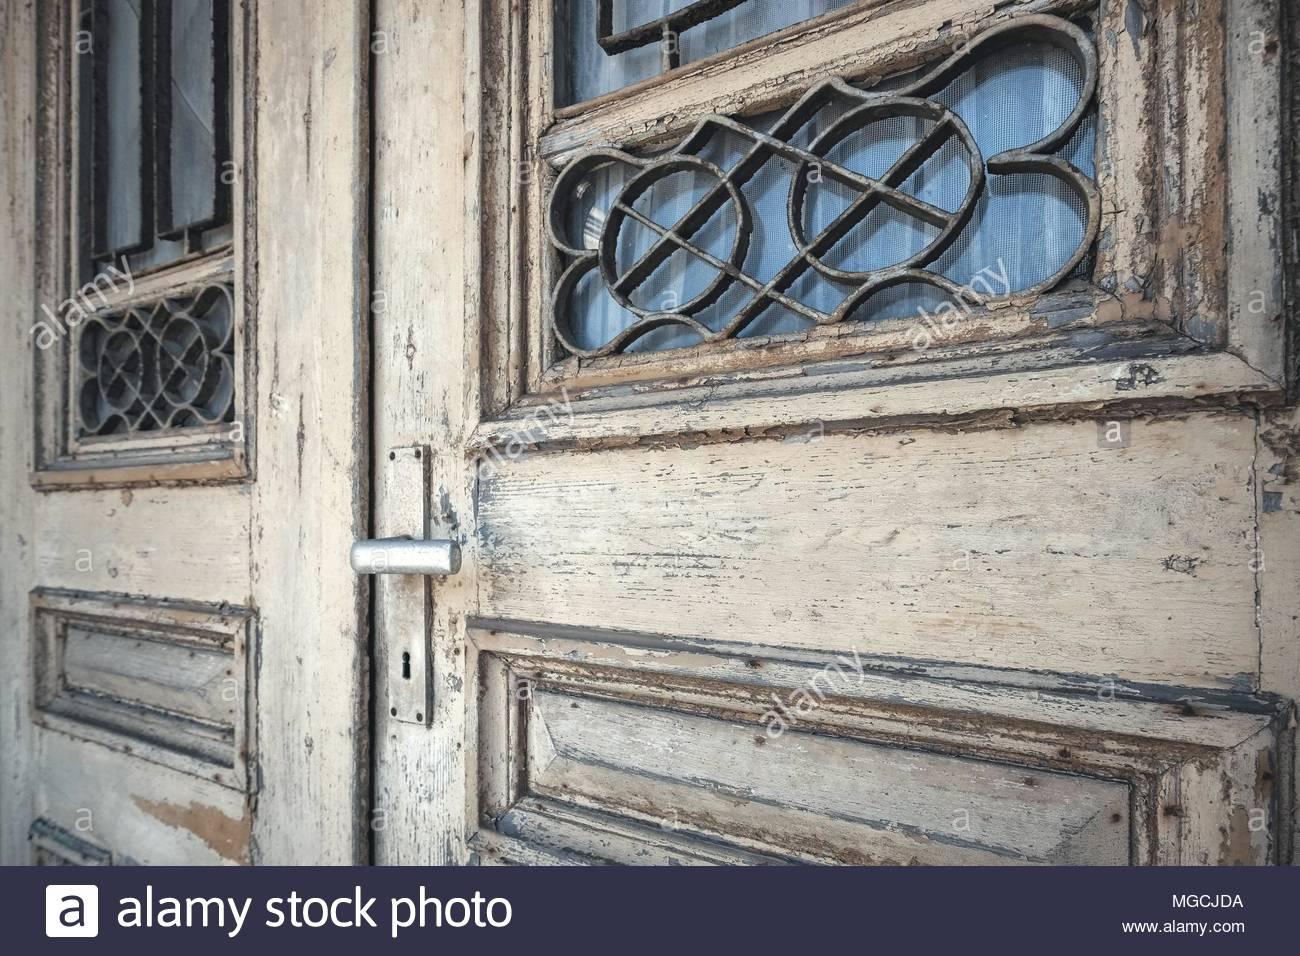 Alte, marode Haustür aus Holz Photo Stock